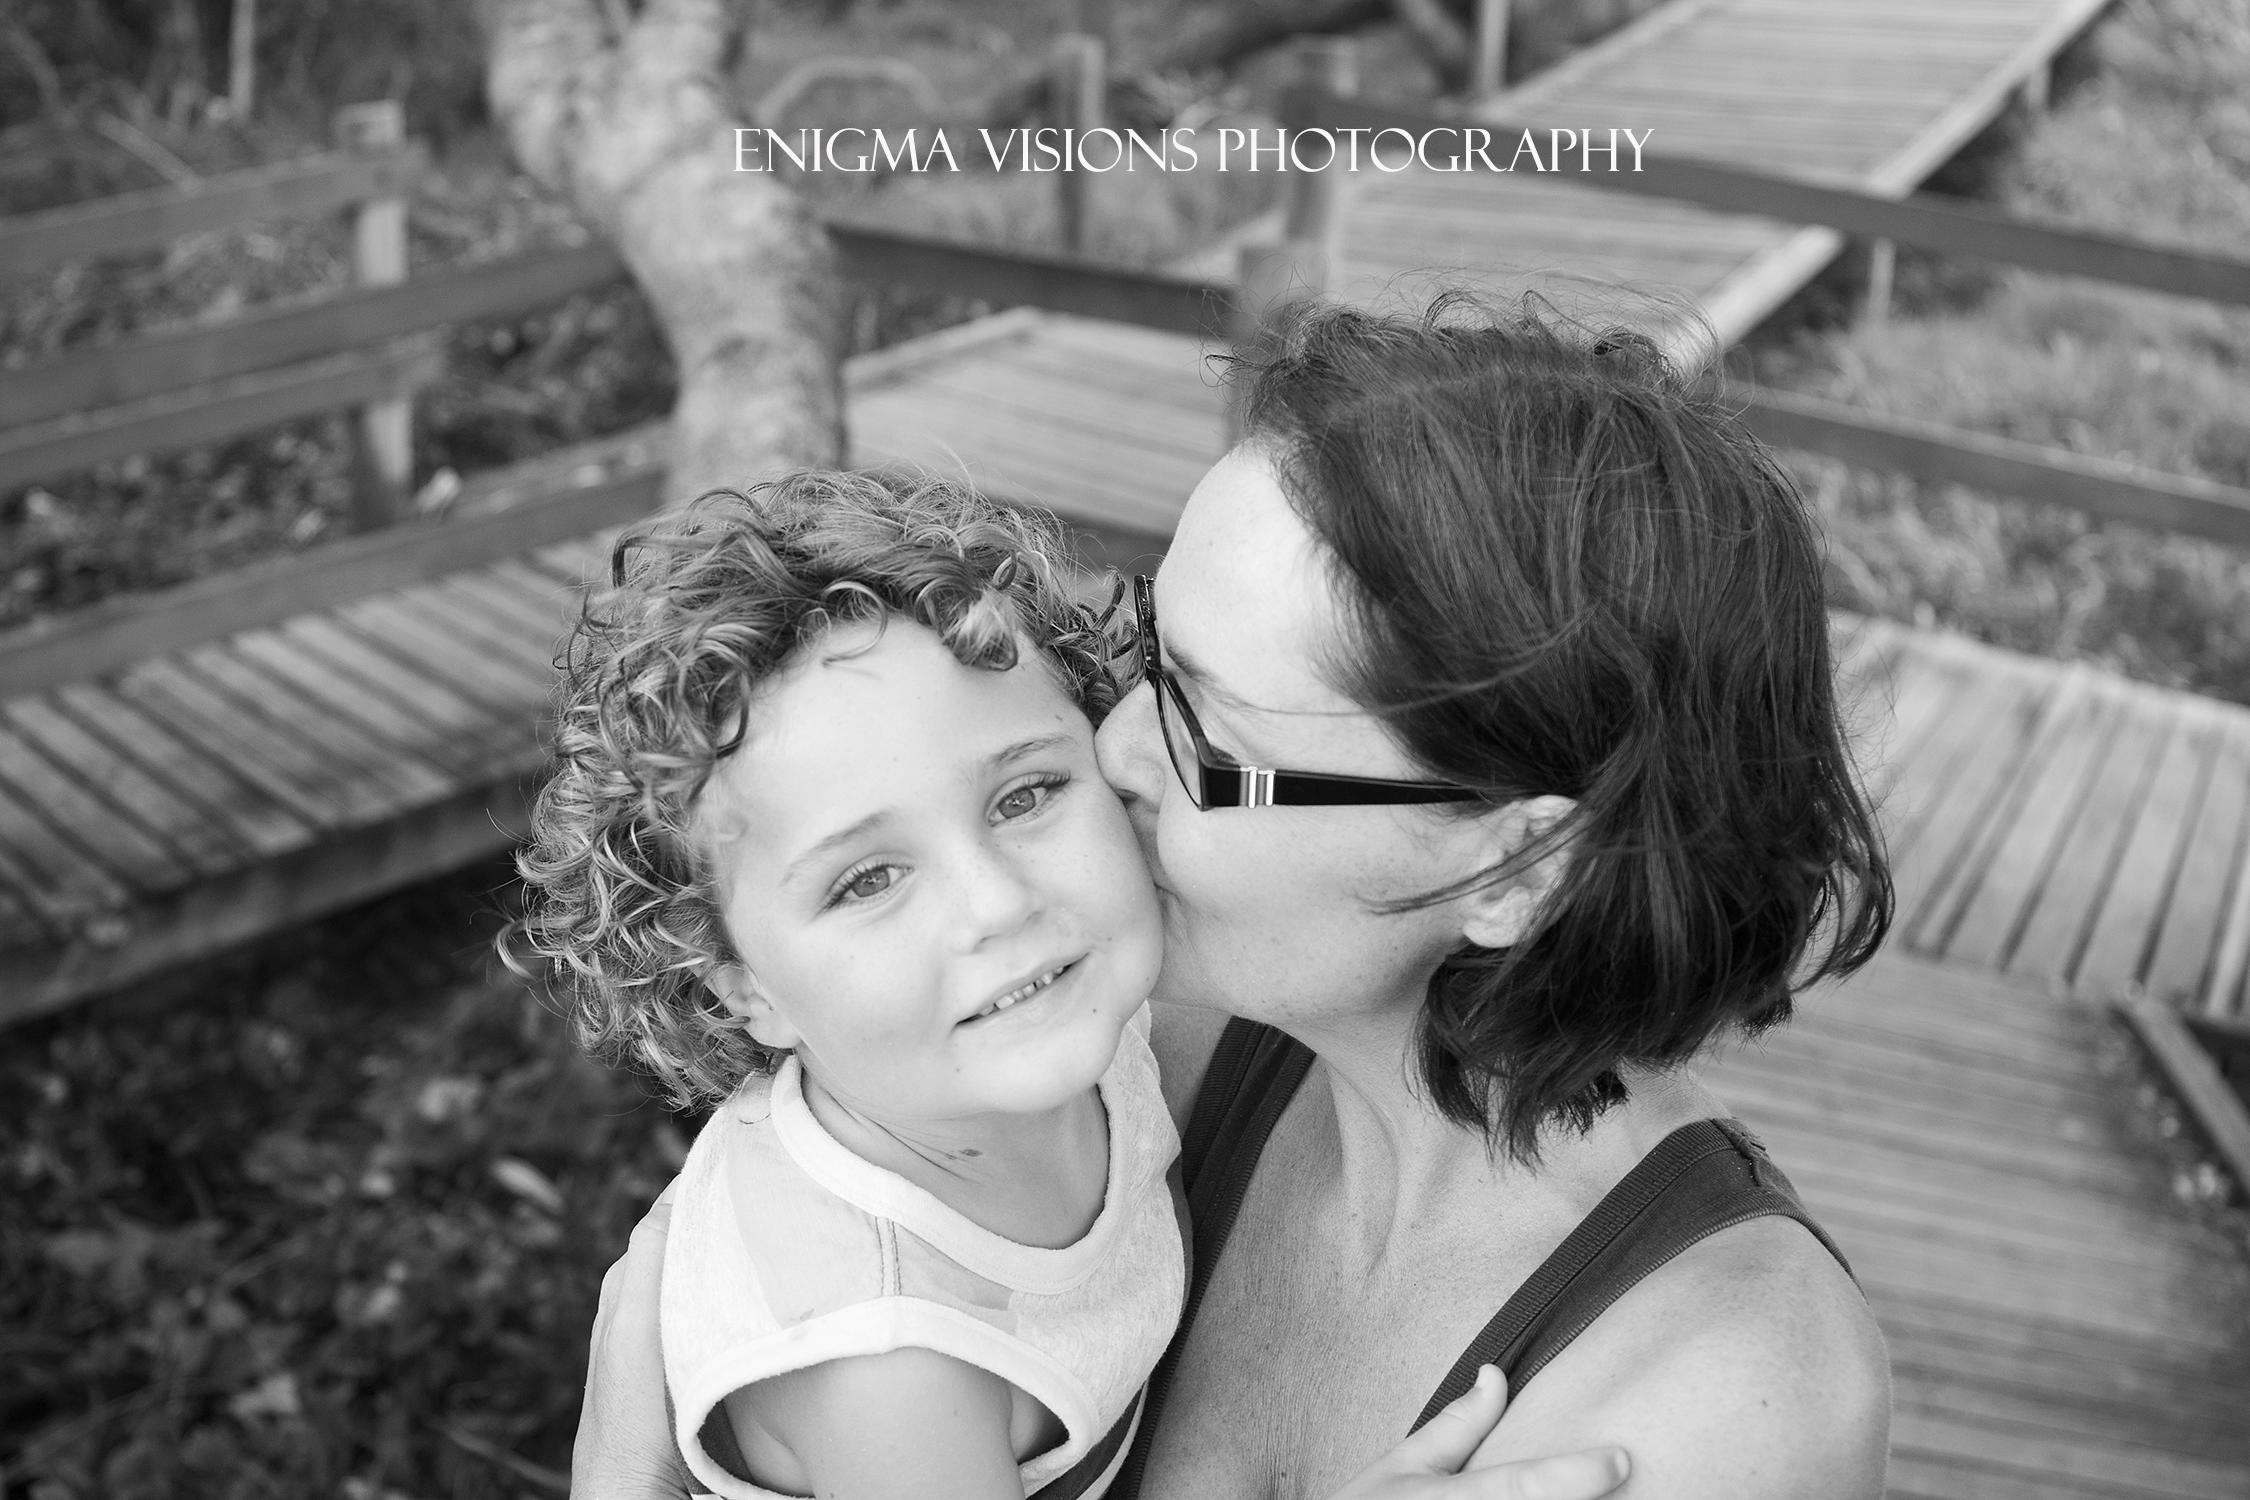 EnigmaVisionsPhotography_FAMILY_Henschke (4).jpg